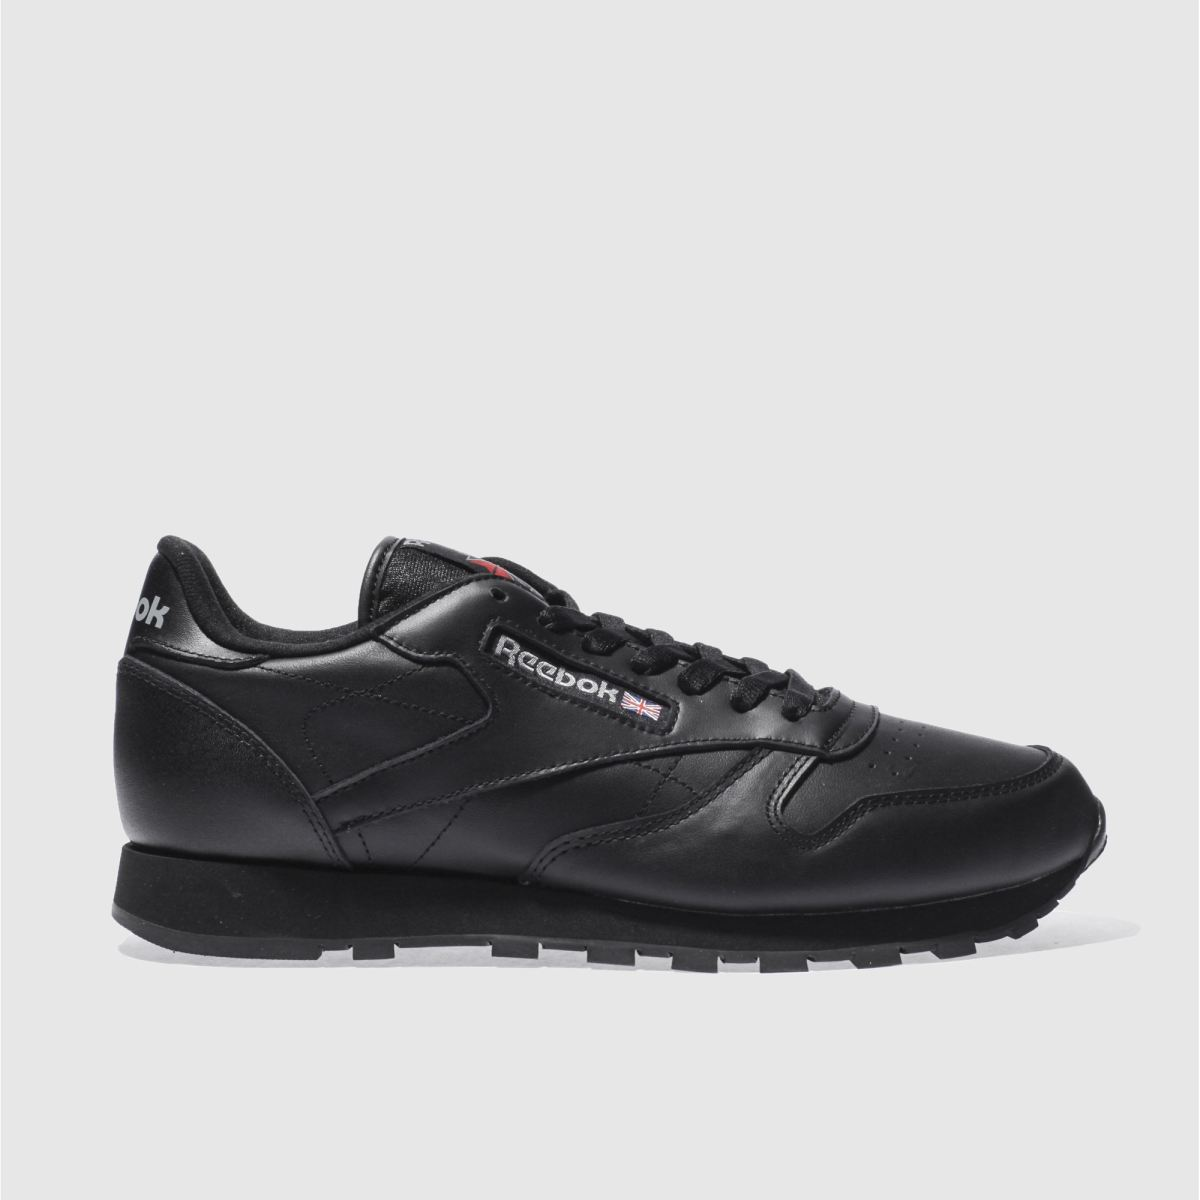 Reebok Black Classic Leather Trainers